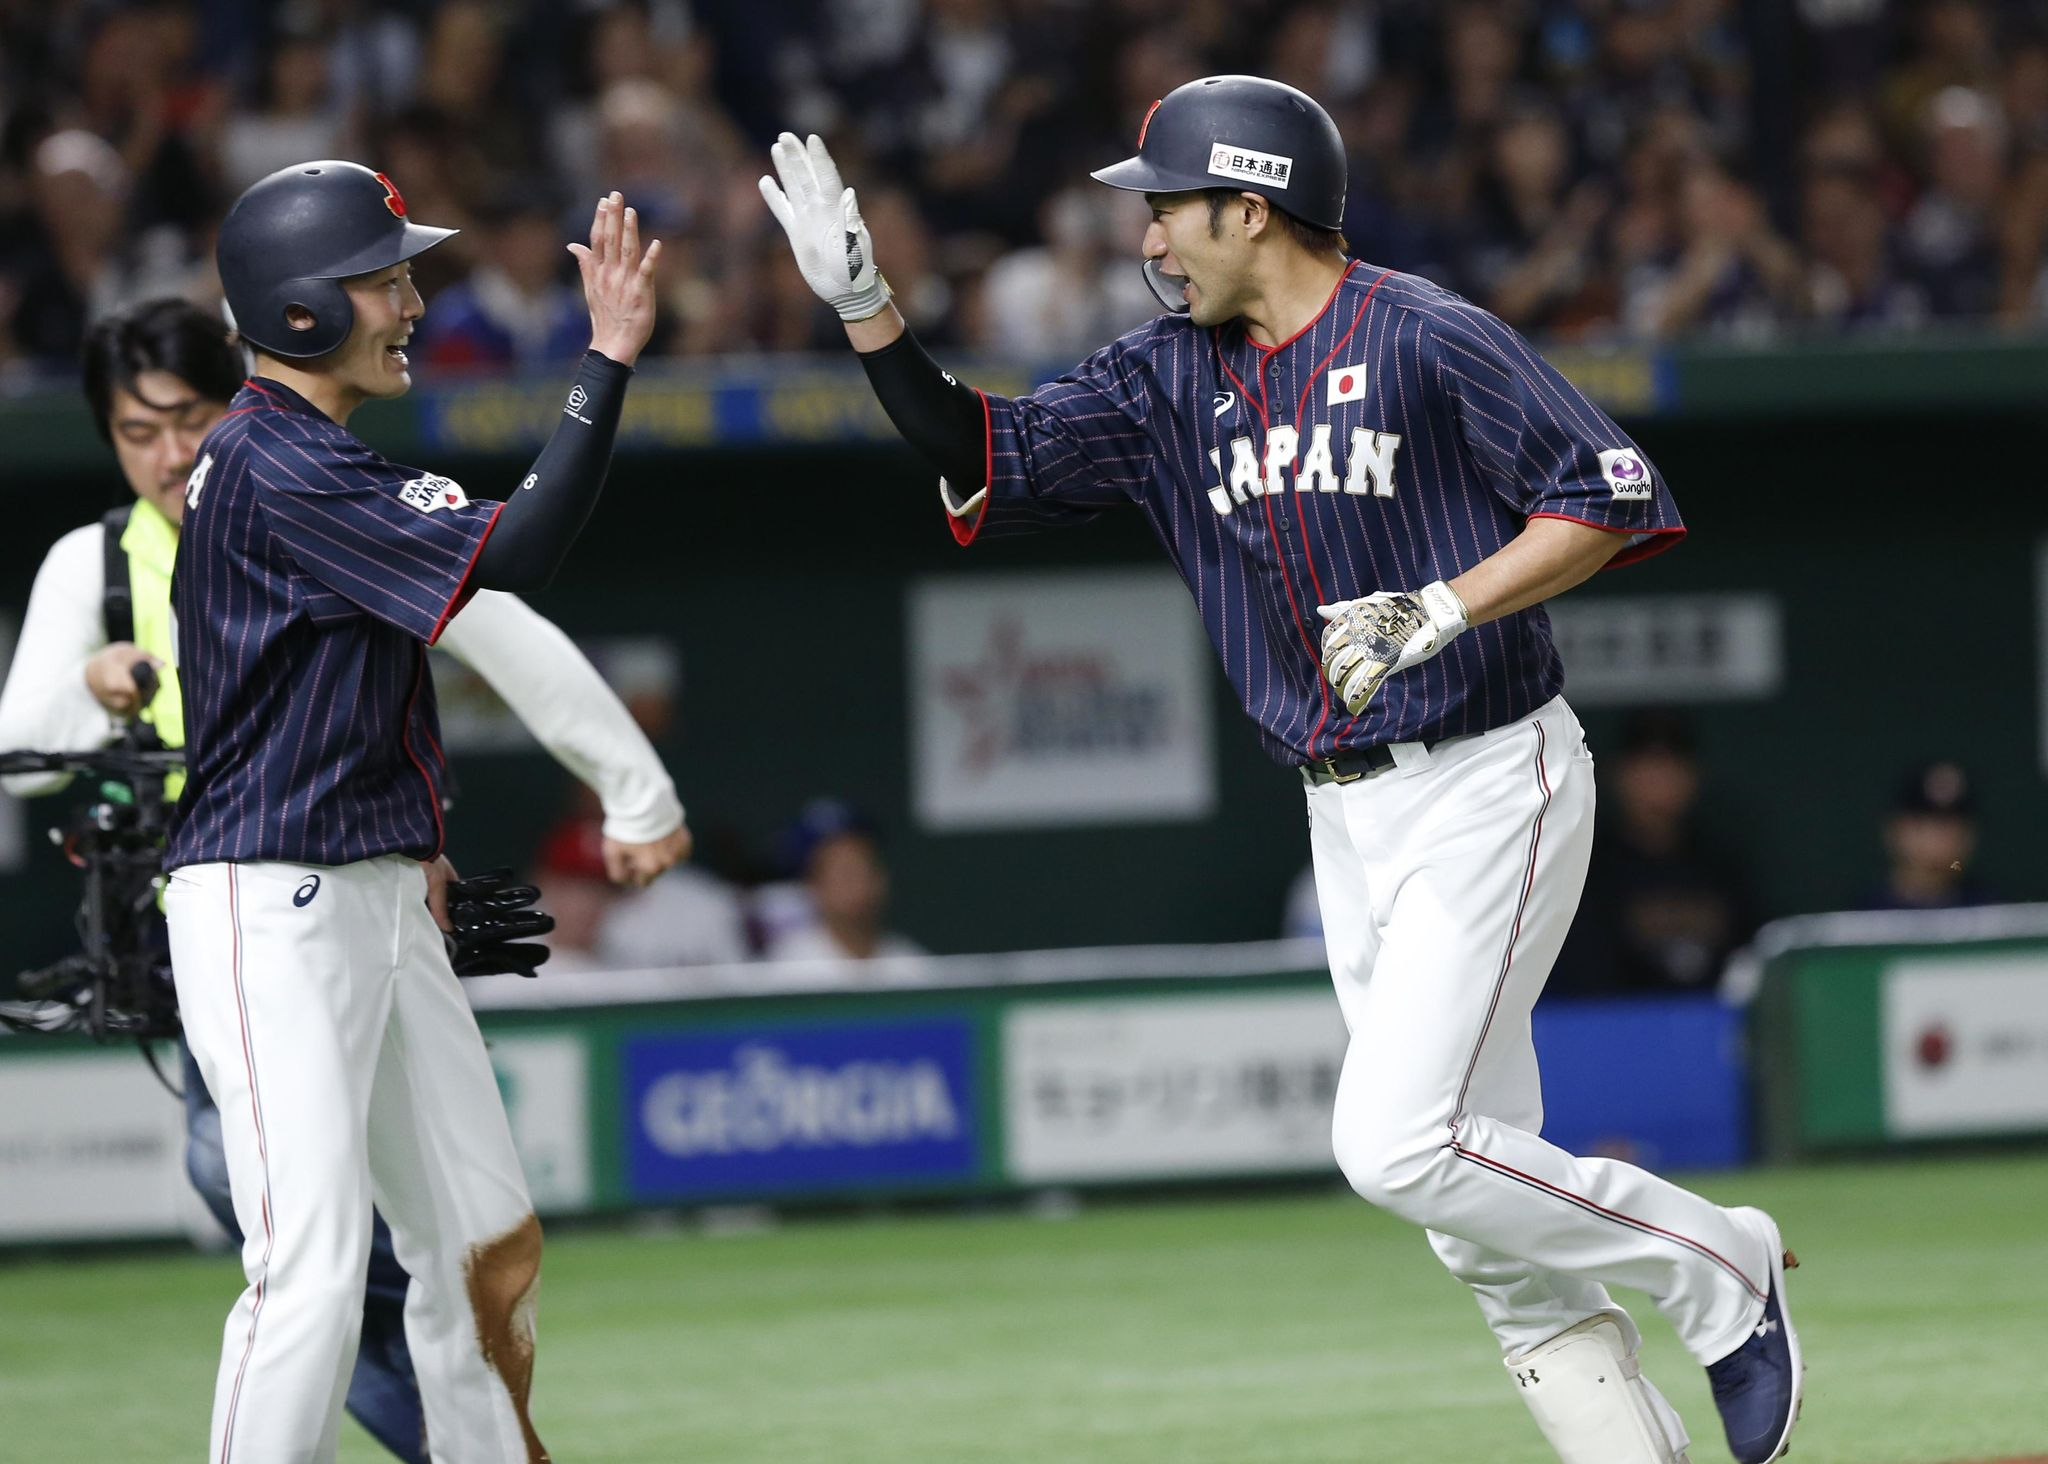 Japan_mlb_all_stars_baseball_53132_s2048x1464